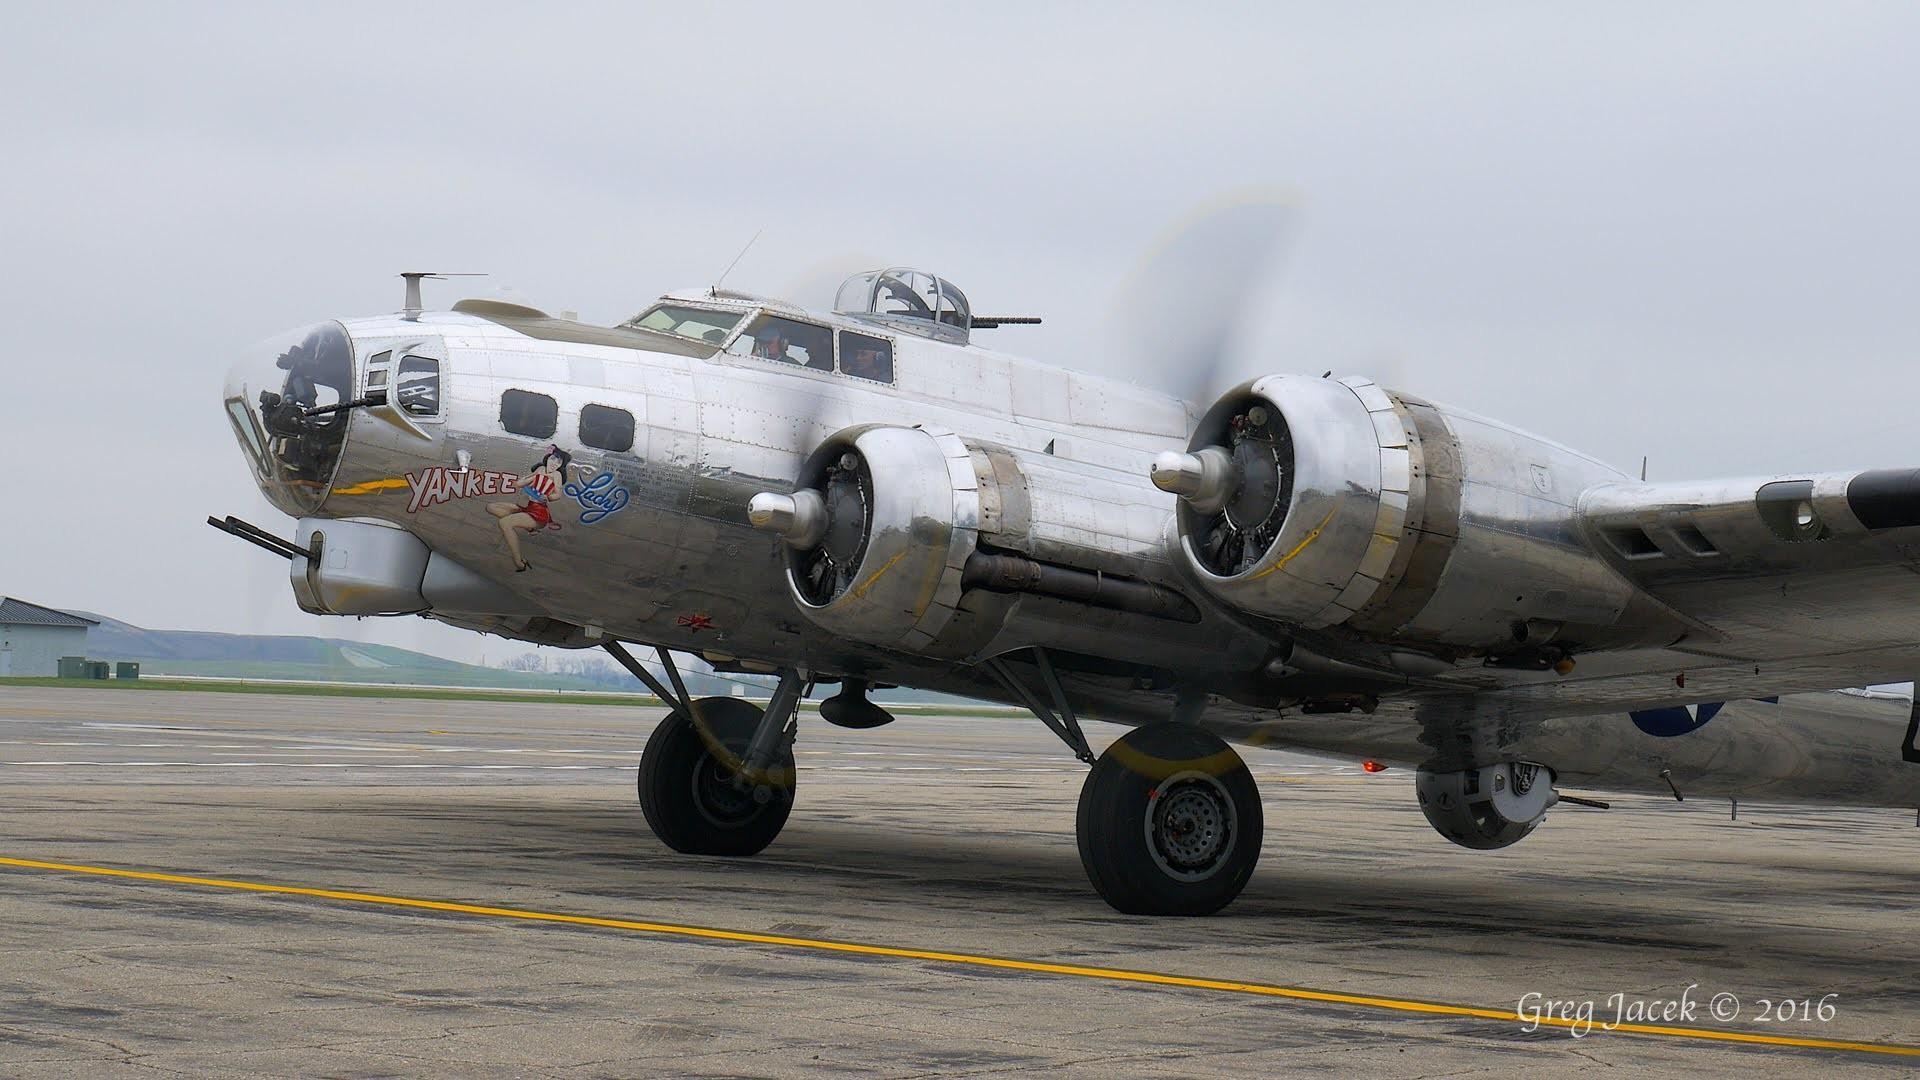 B-17 Yankee Lady Start-up and Take-off 5.1 Surround Sound 4K